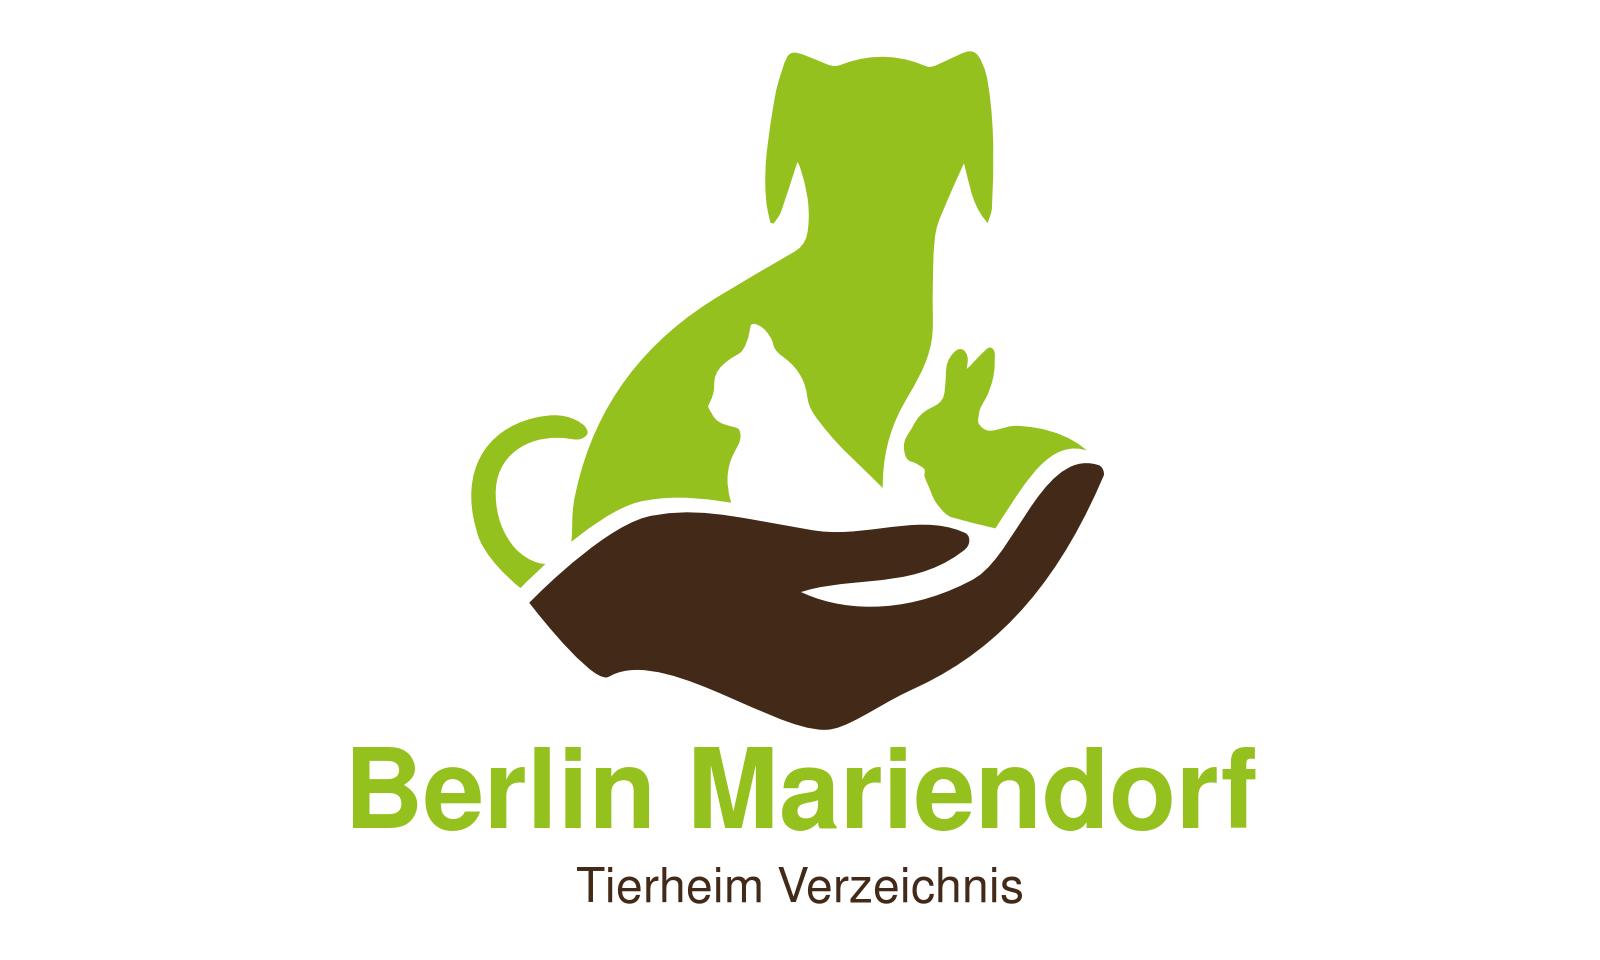 Tierheim Berlin Mariendorf